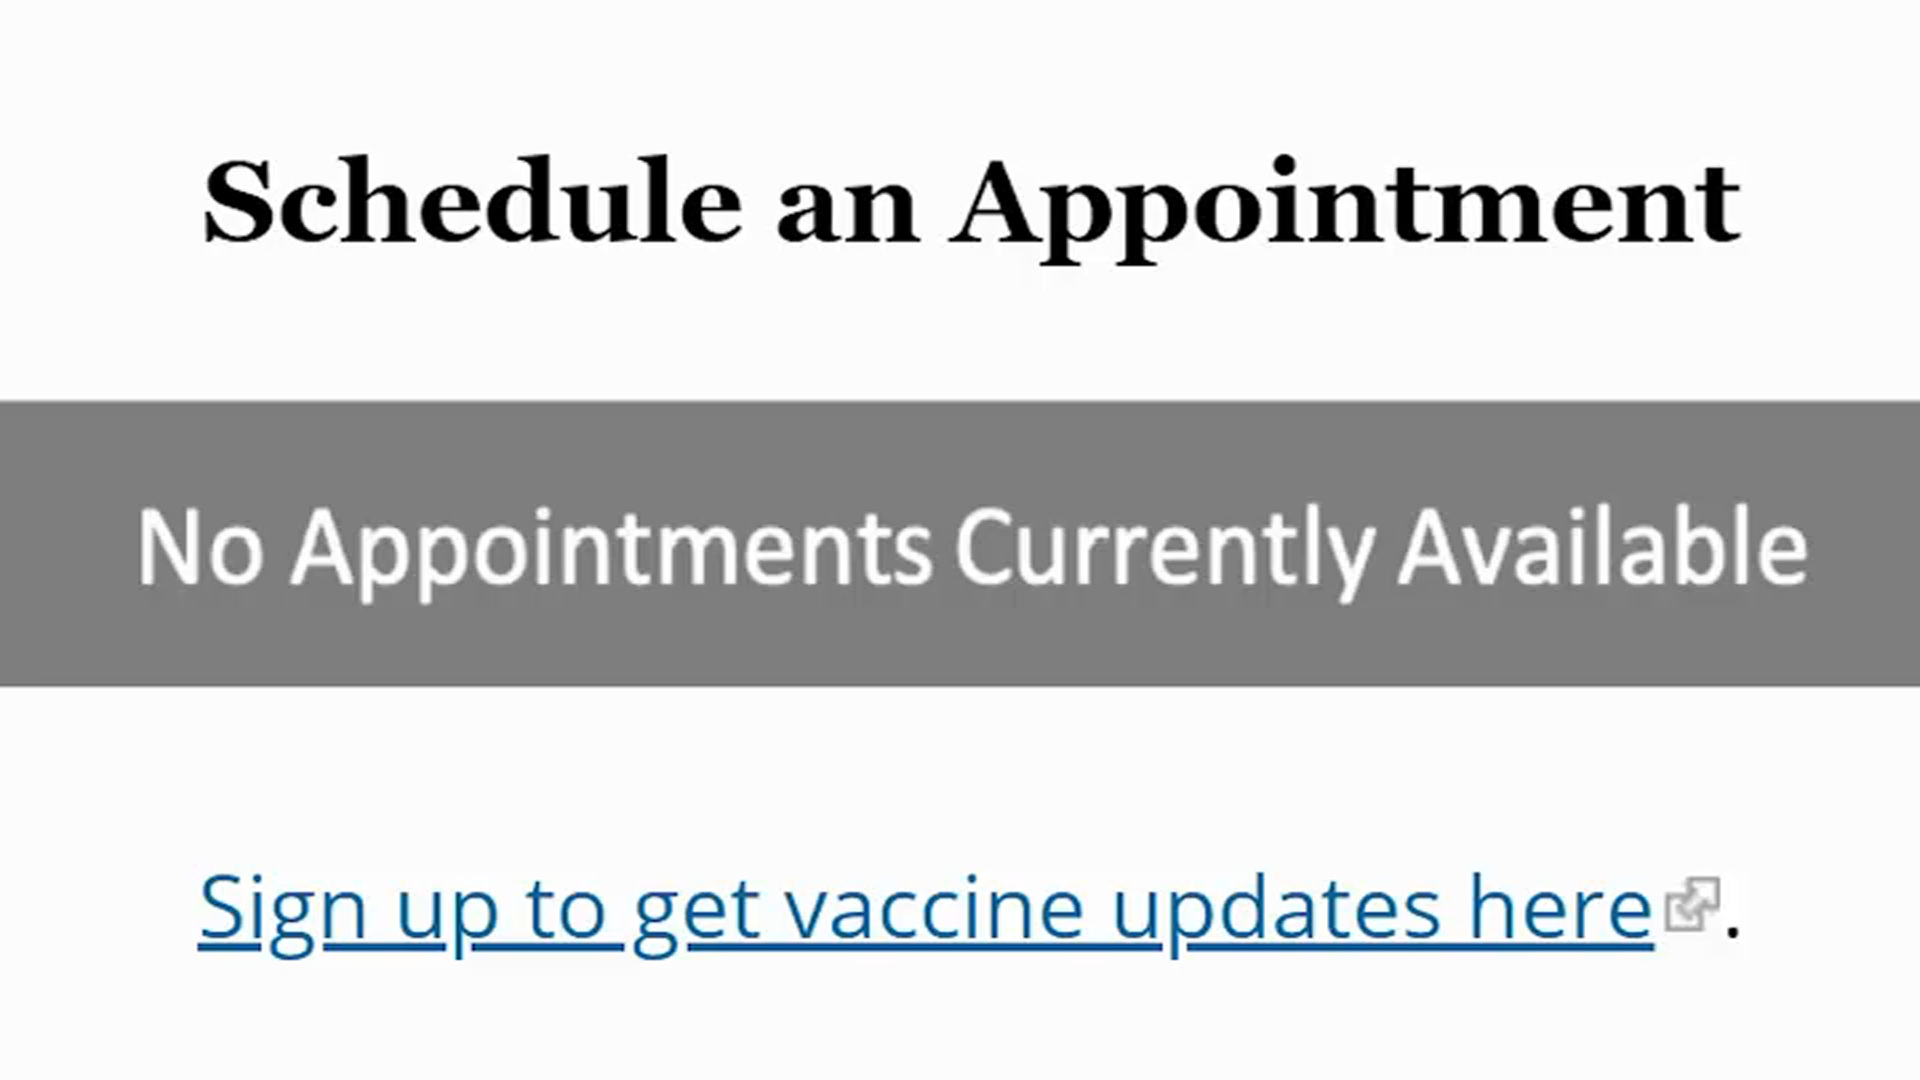 DC Addresses Apparent Disparity in Vaccine Availability